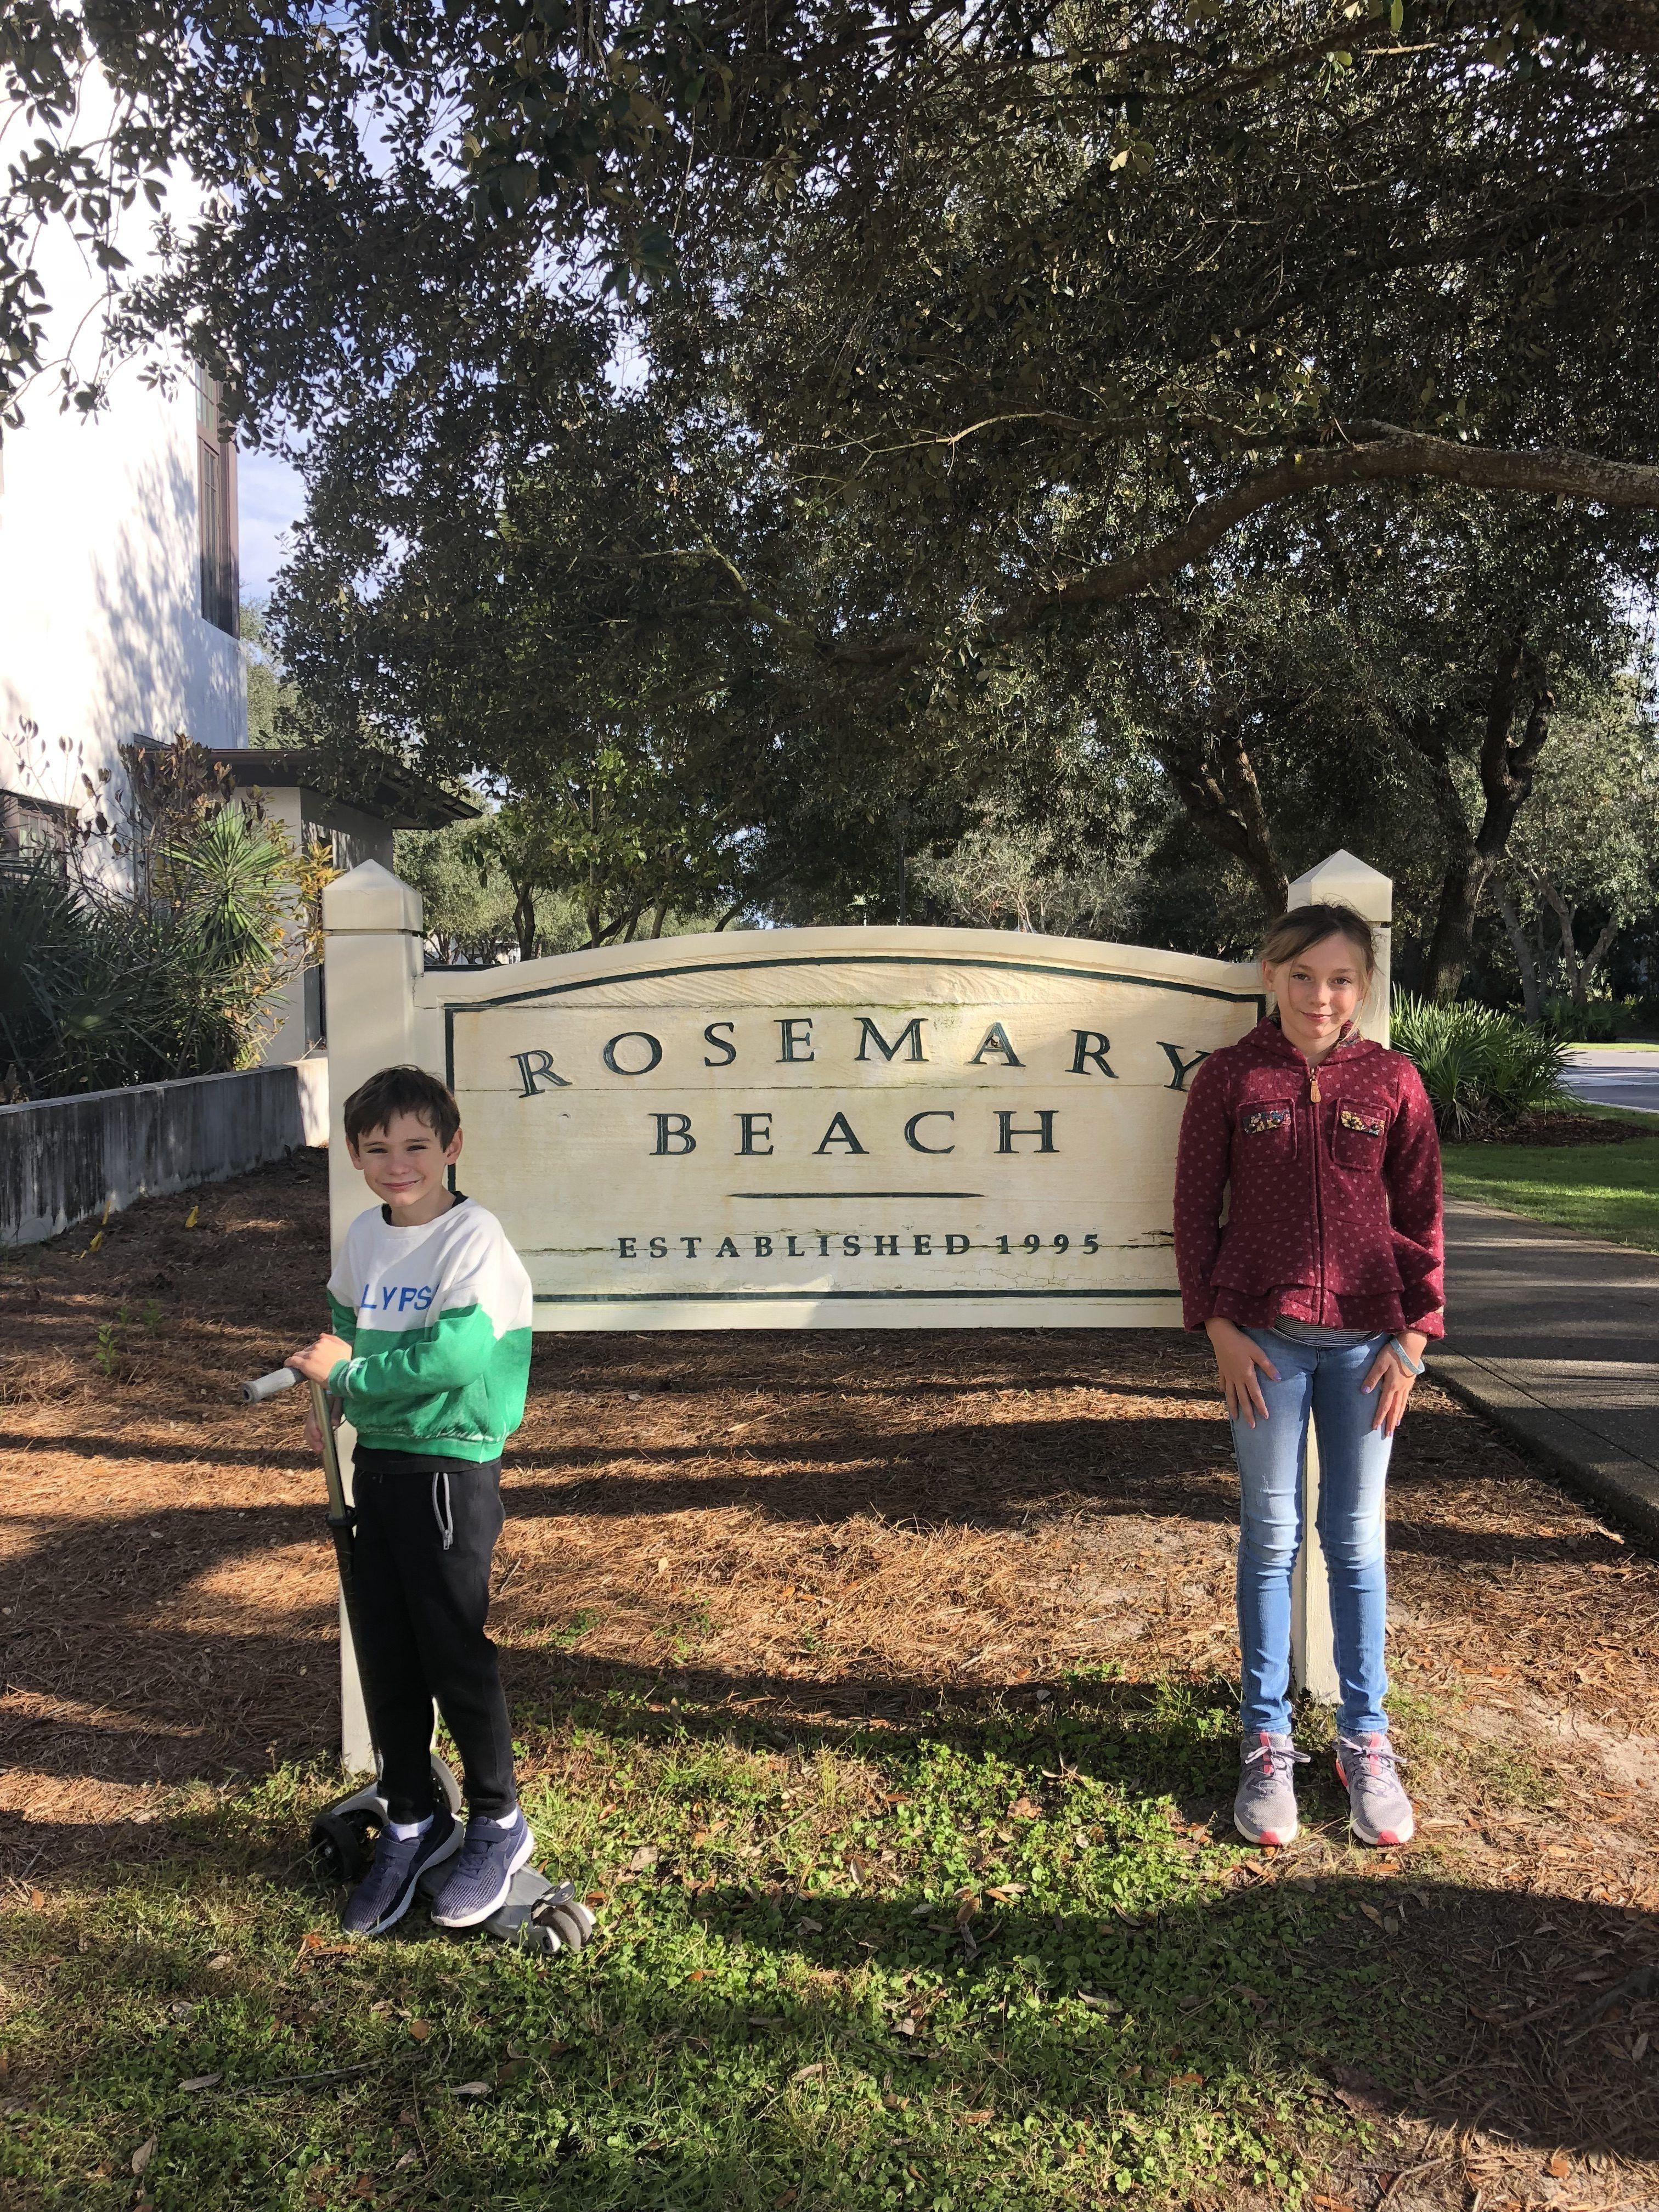 Florida Rosemarybeach On 30a Gulf Coast In 2019 Beaches In